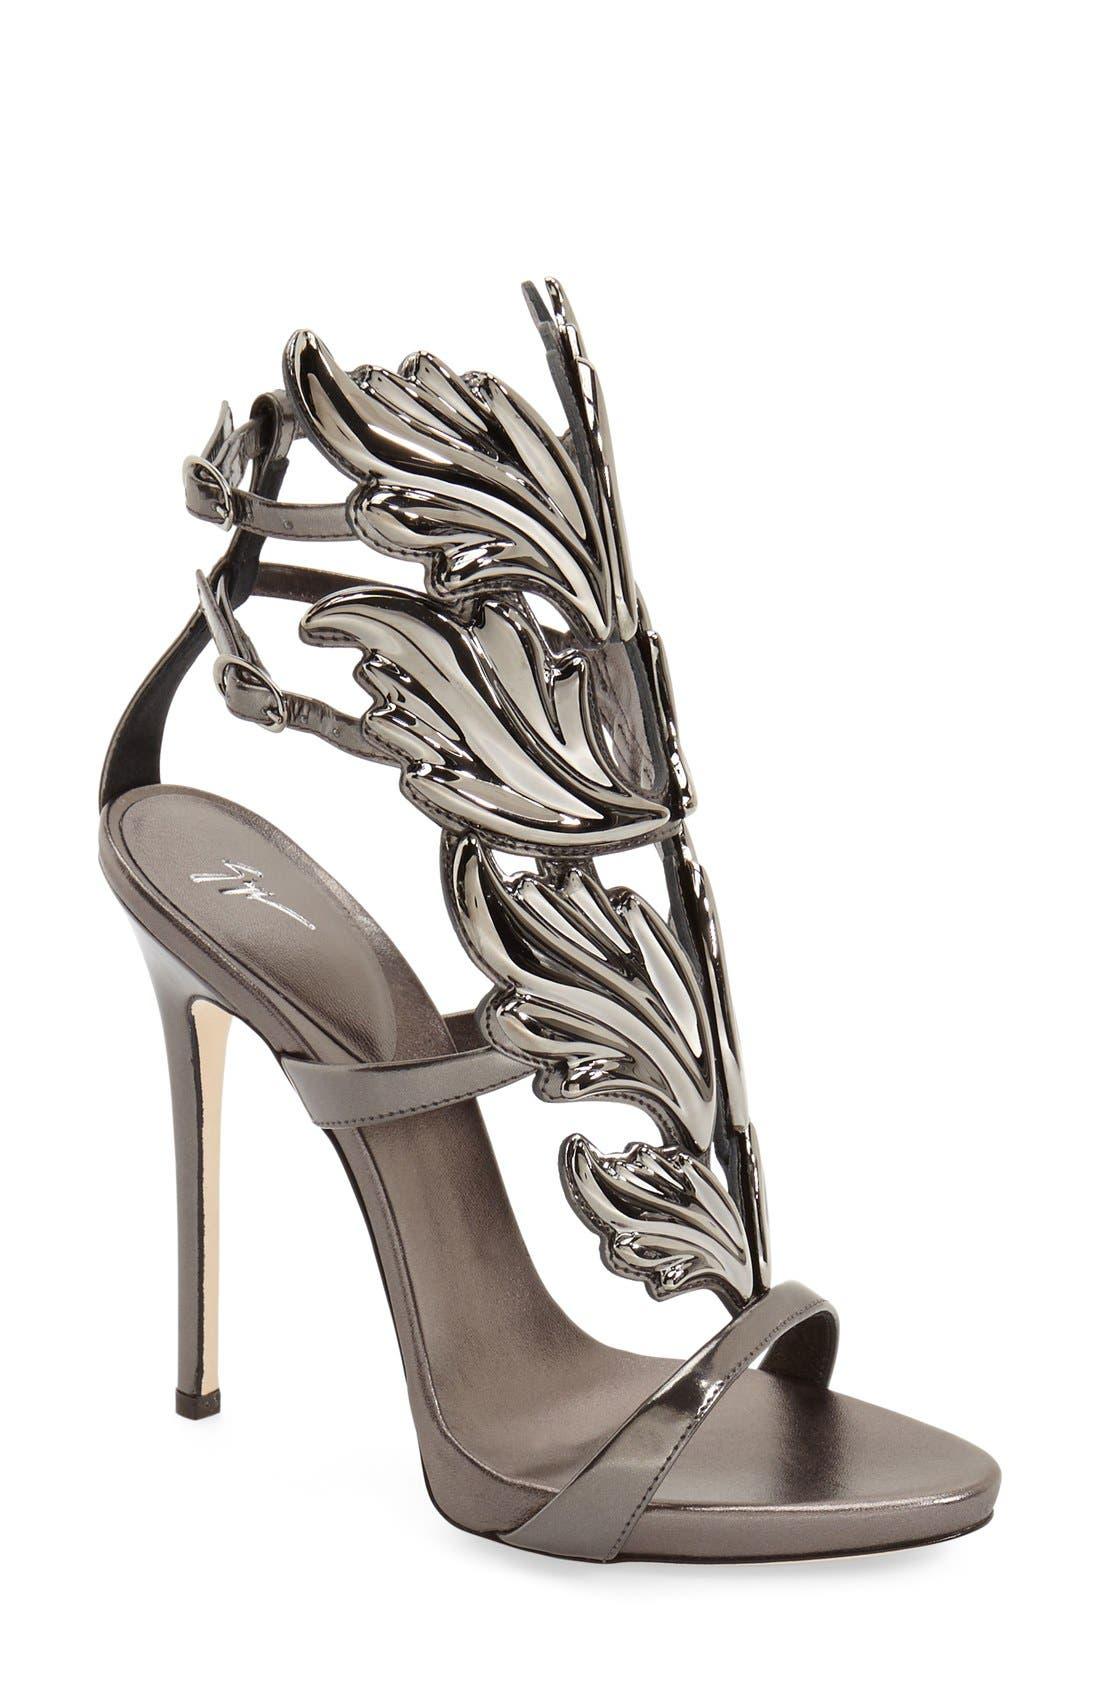 Main Image - Giuseppe Zanotti 'Cruel' Wing Sandal (Women) (Nordstrom Exclusive)